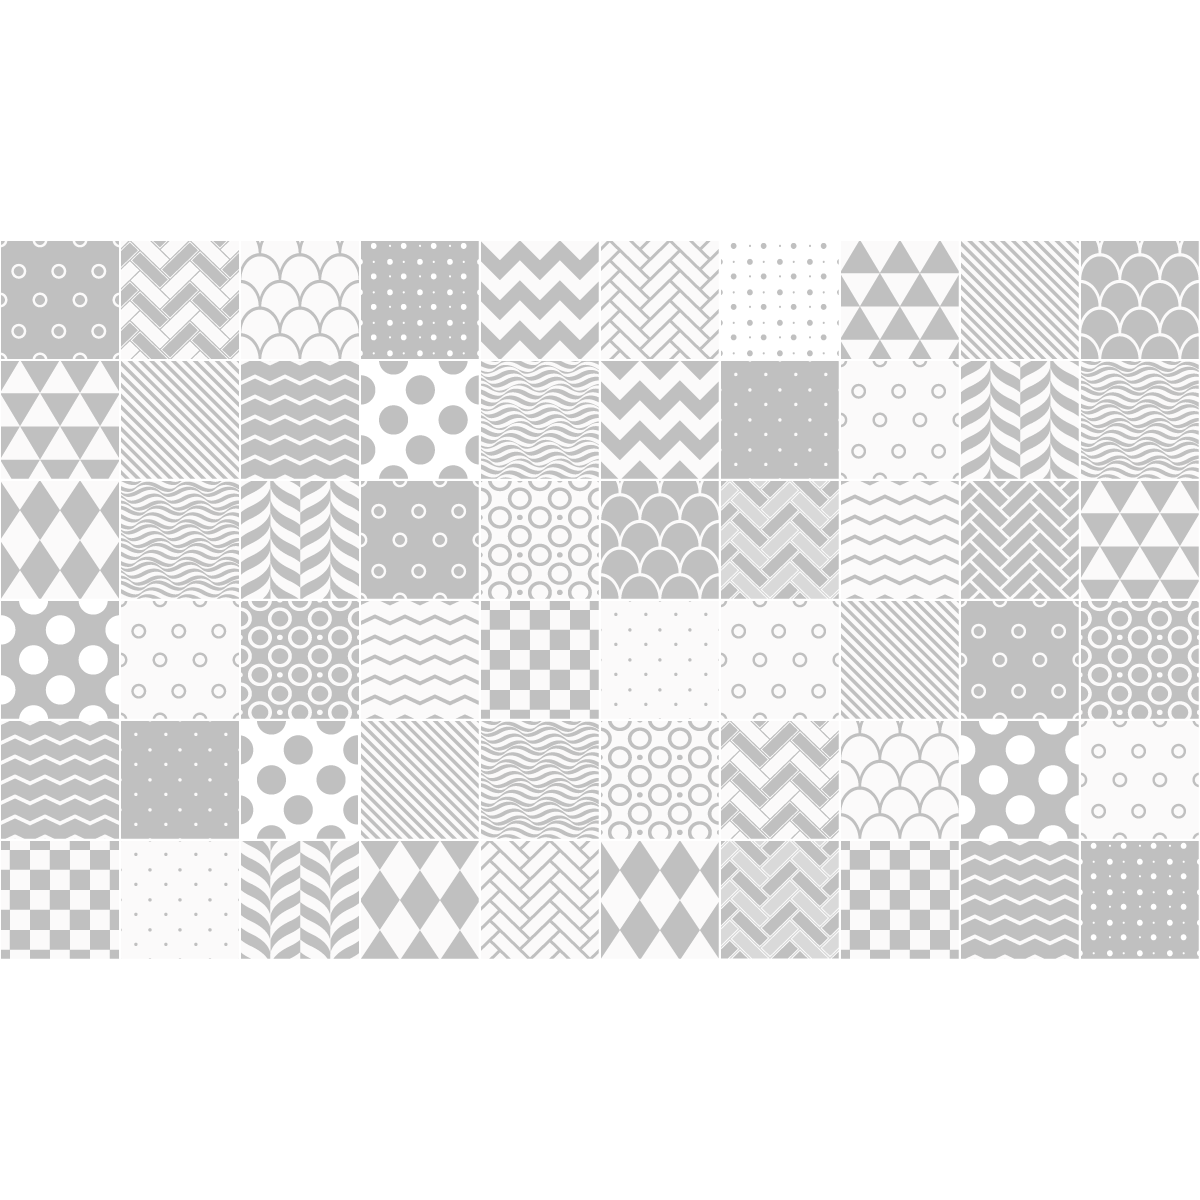 60 stickers carreaux de ciment scandinave cardiff. Black Bedroom Furniture Sets. Home Design Ideas